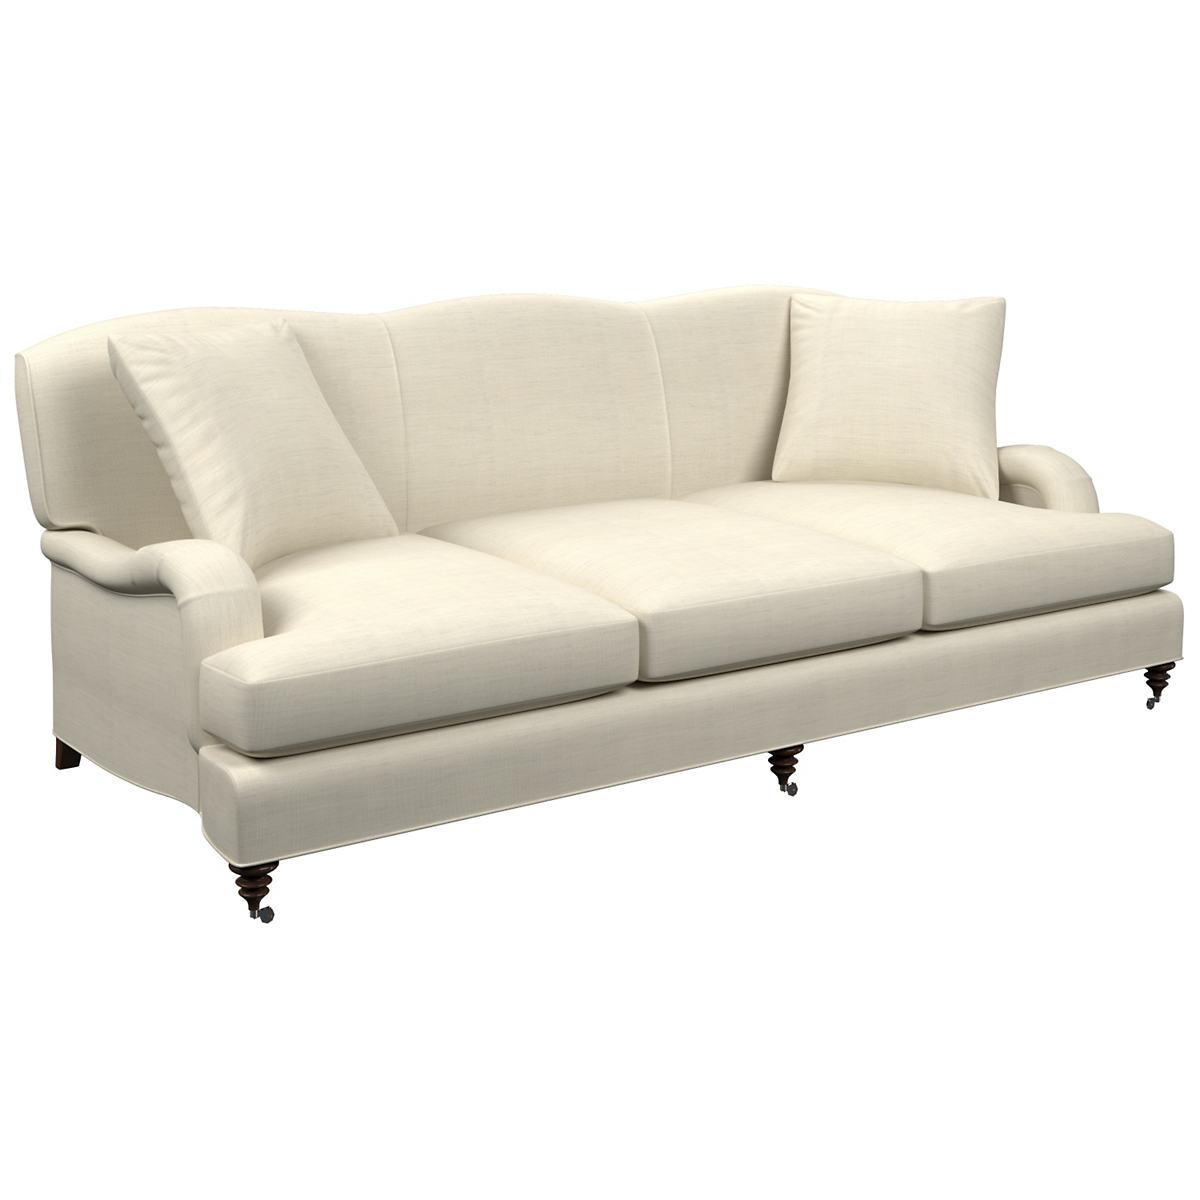 Superb Estate Linen Pearl Grey Litchfield 3 Seater Sofa Cjindustries Chair Design For Home Cjindustriesco